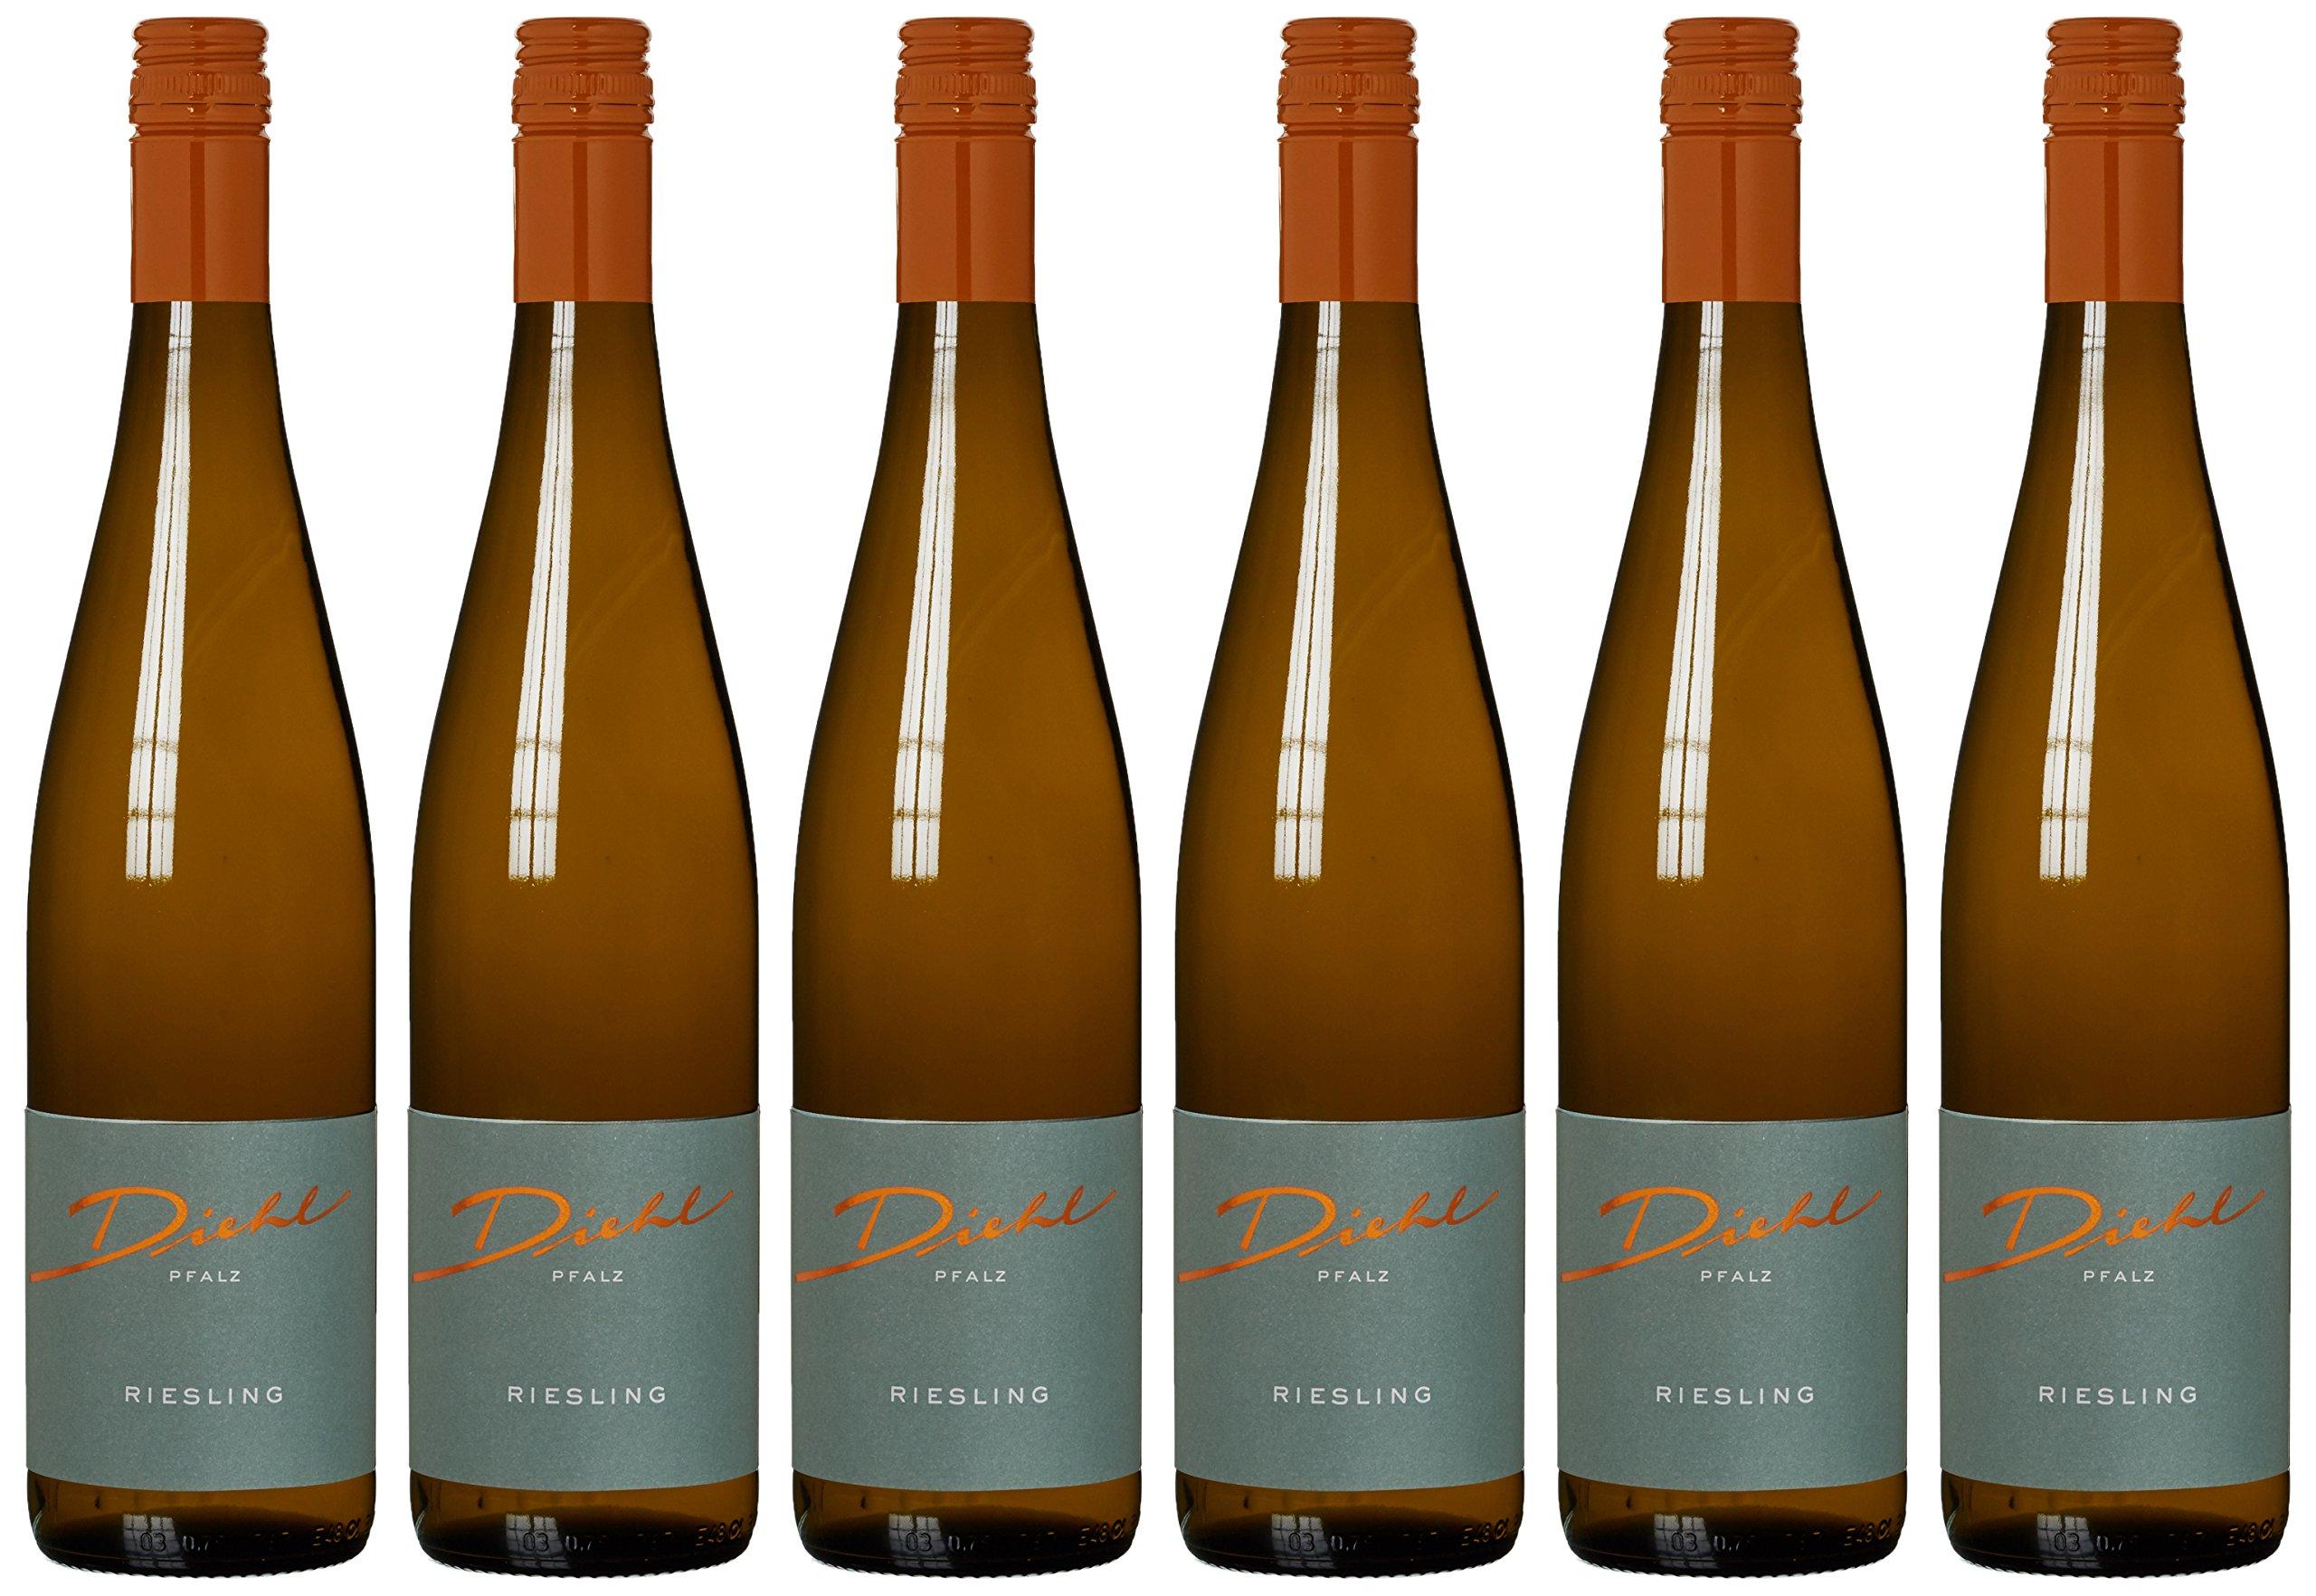 Weingut-Diehl-Pfalz-Riesling-Halbtrocken-6-x-075-l